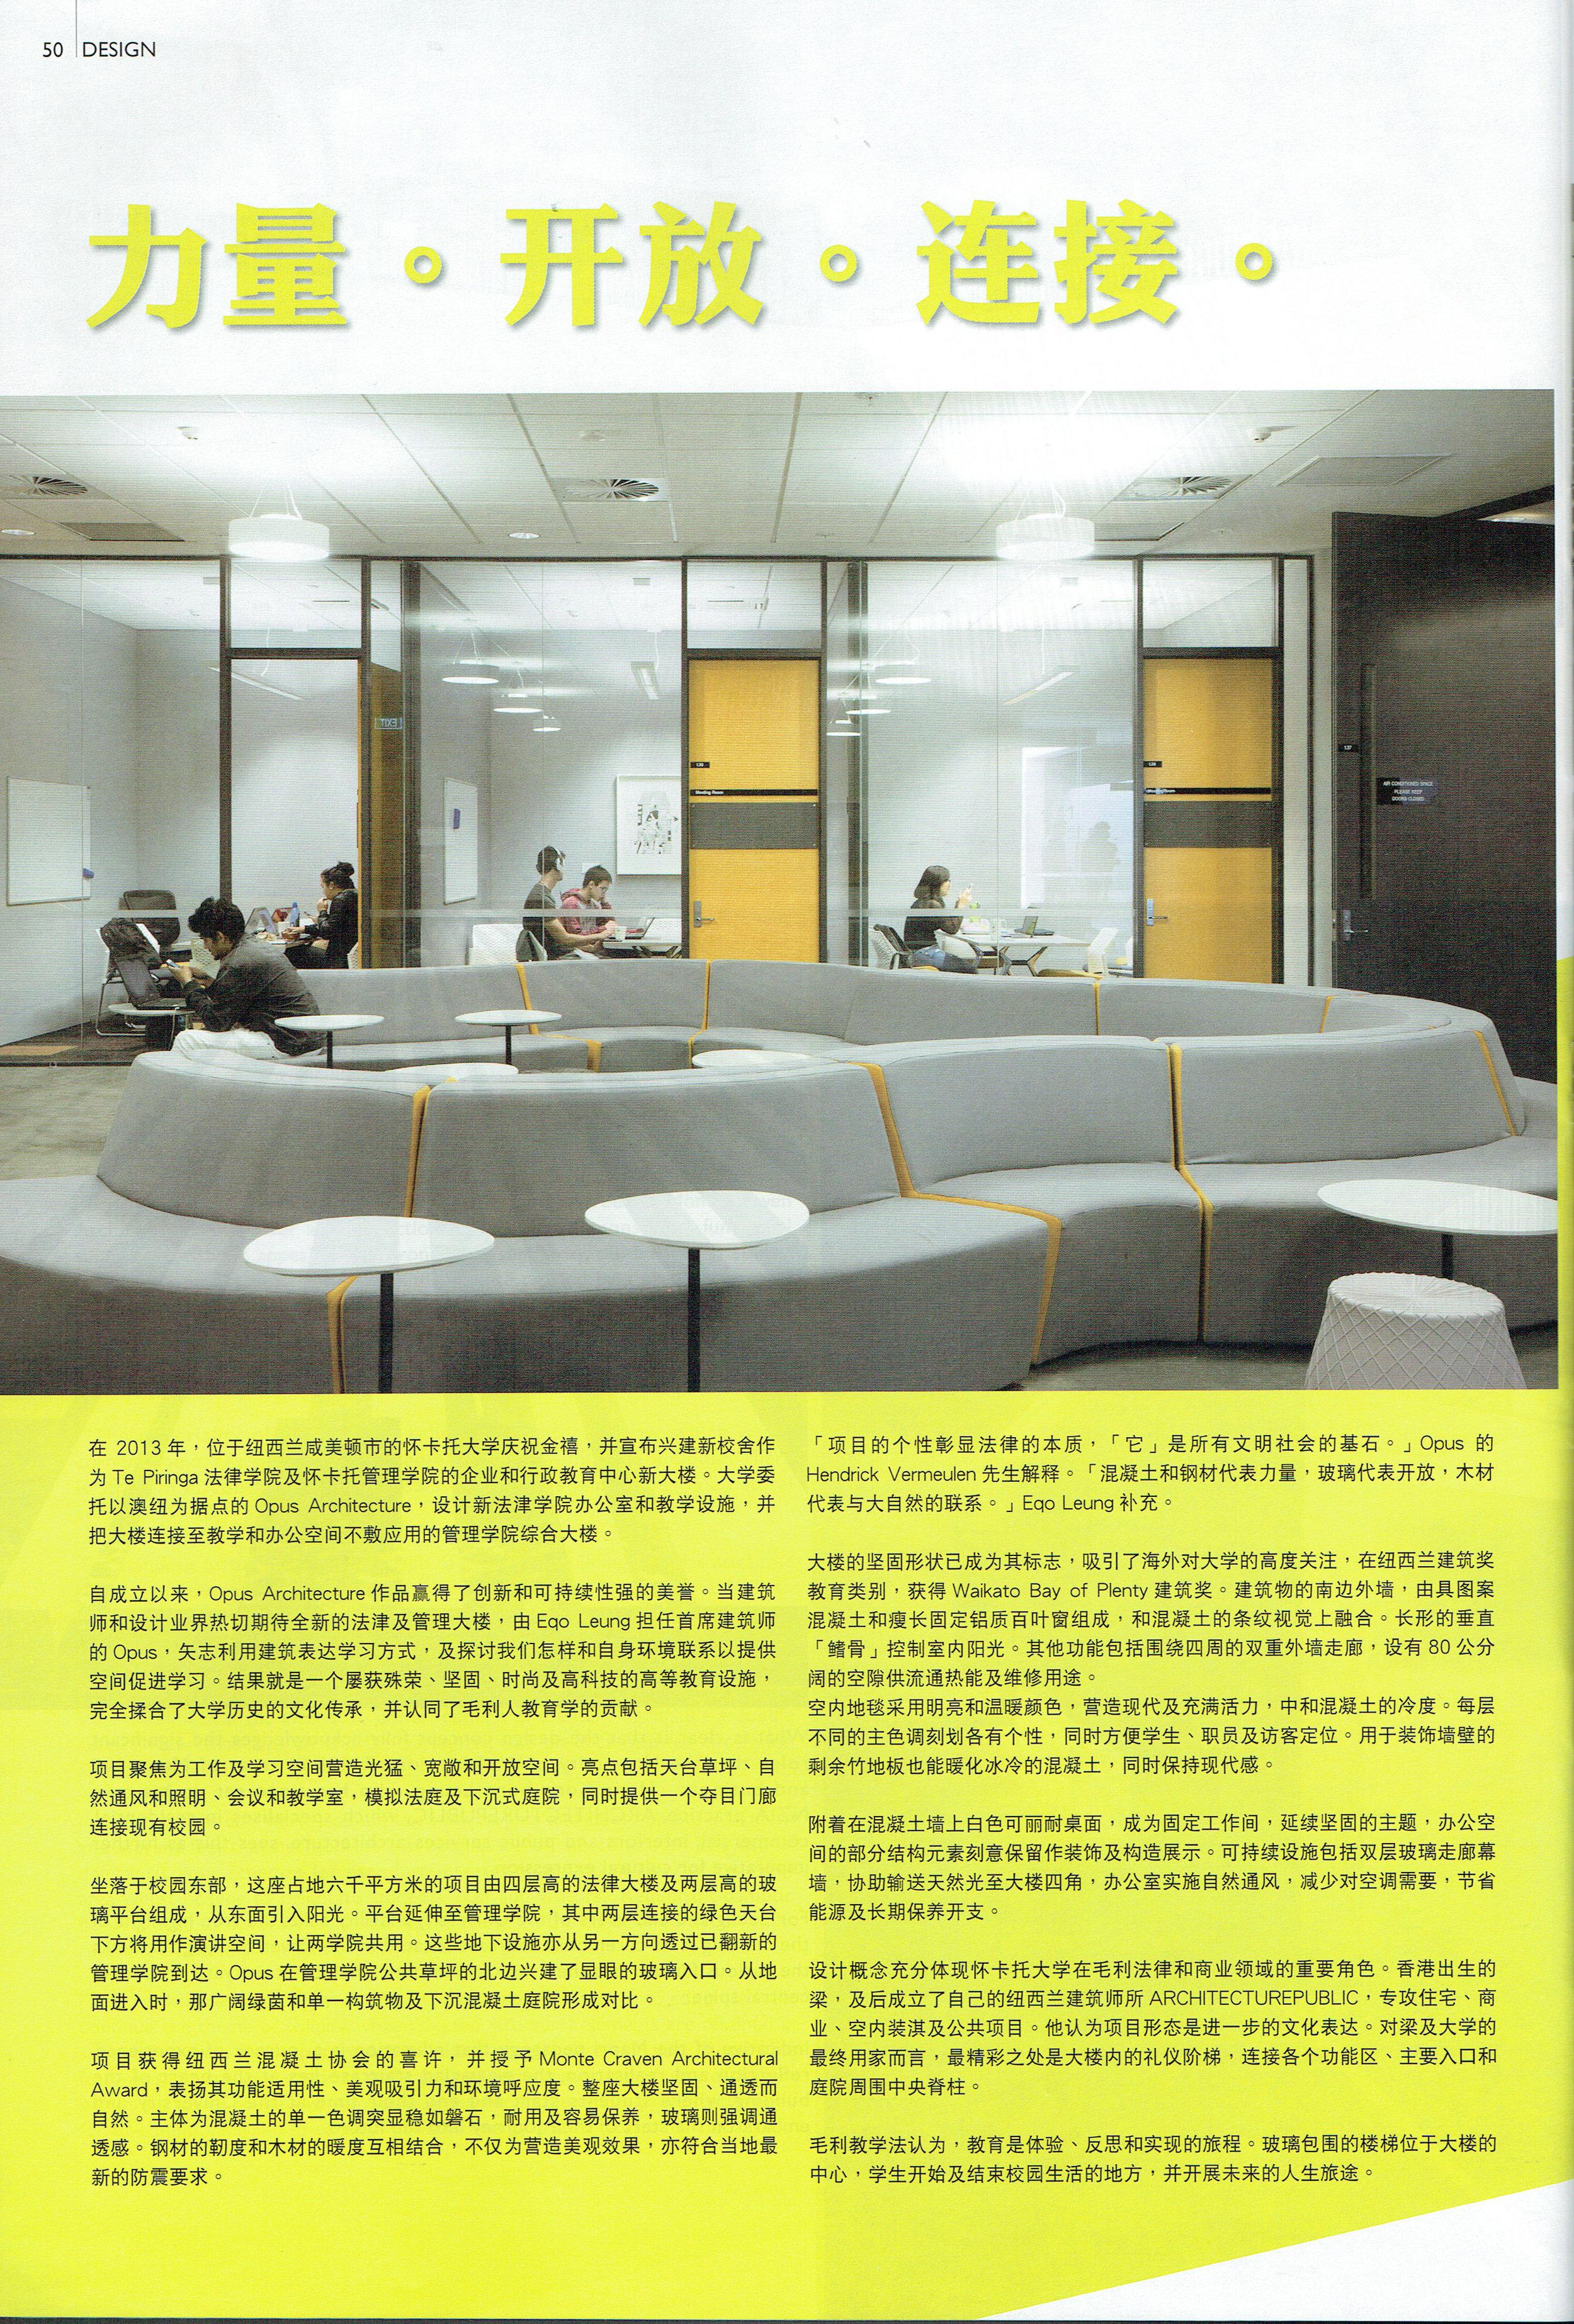 PRC 6.jpeg